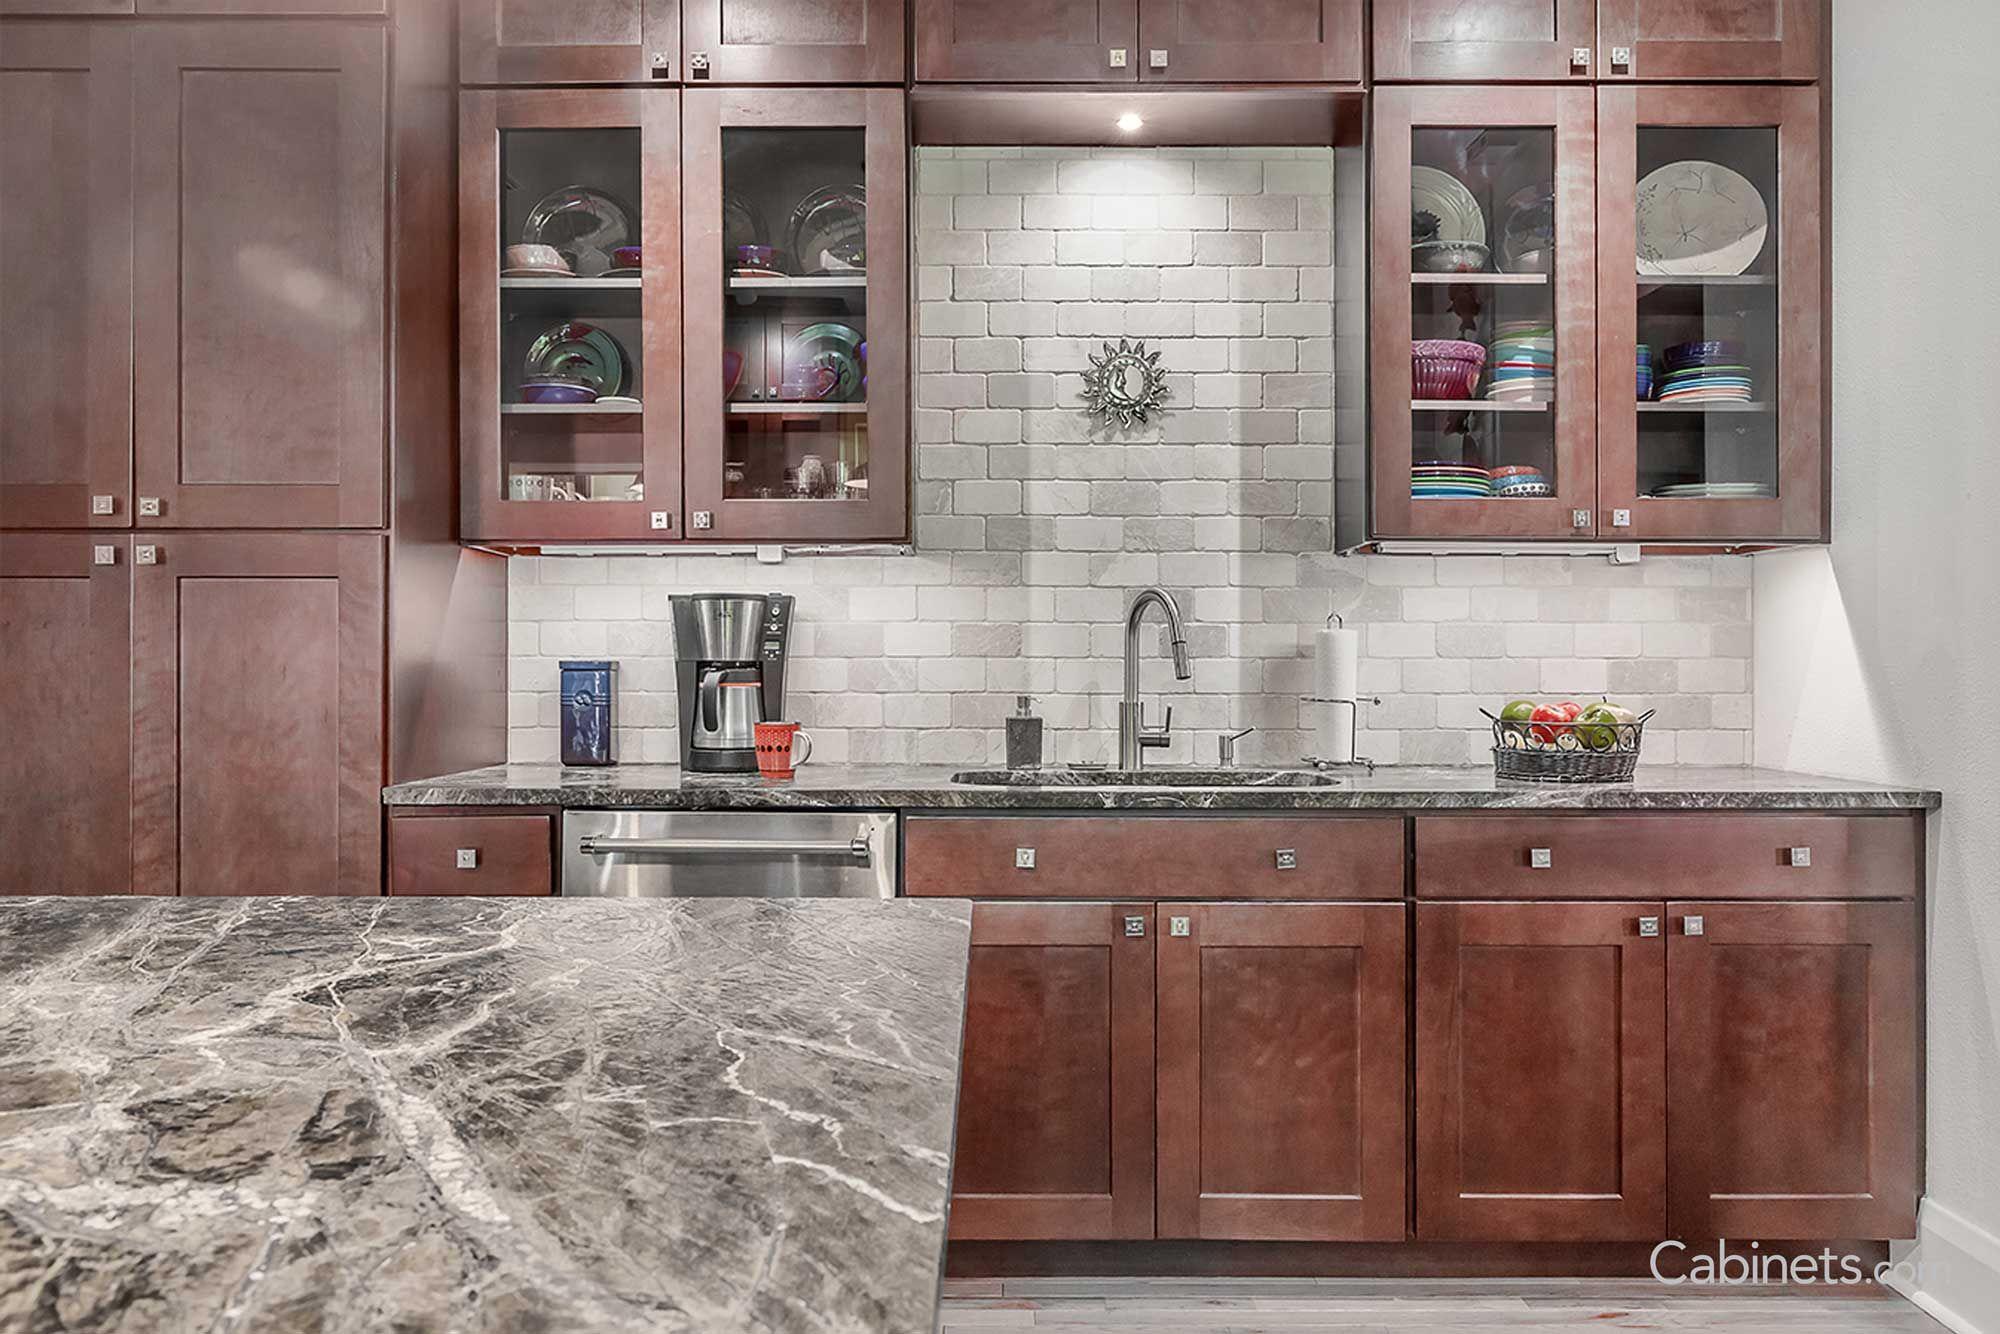 shaker cherry java kitchen renovation kitchen discount cabinets on kitchen cabinets java id=61375